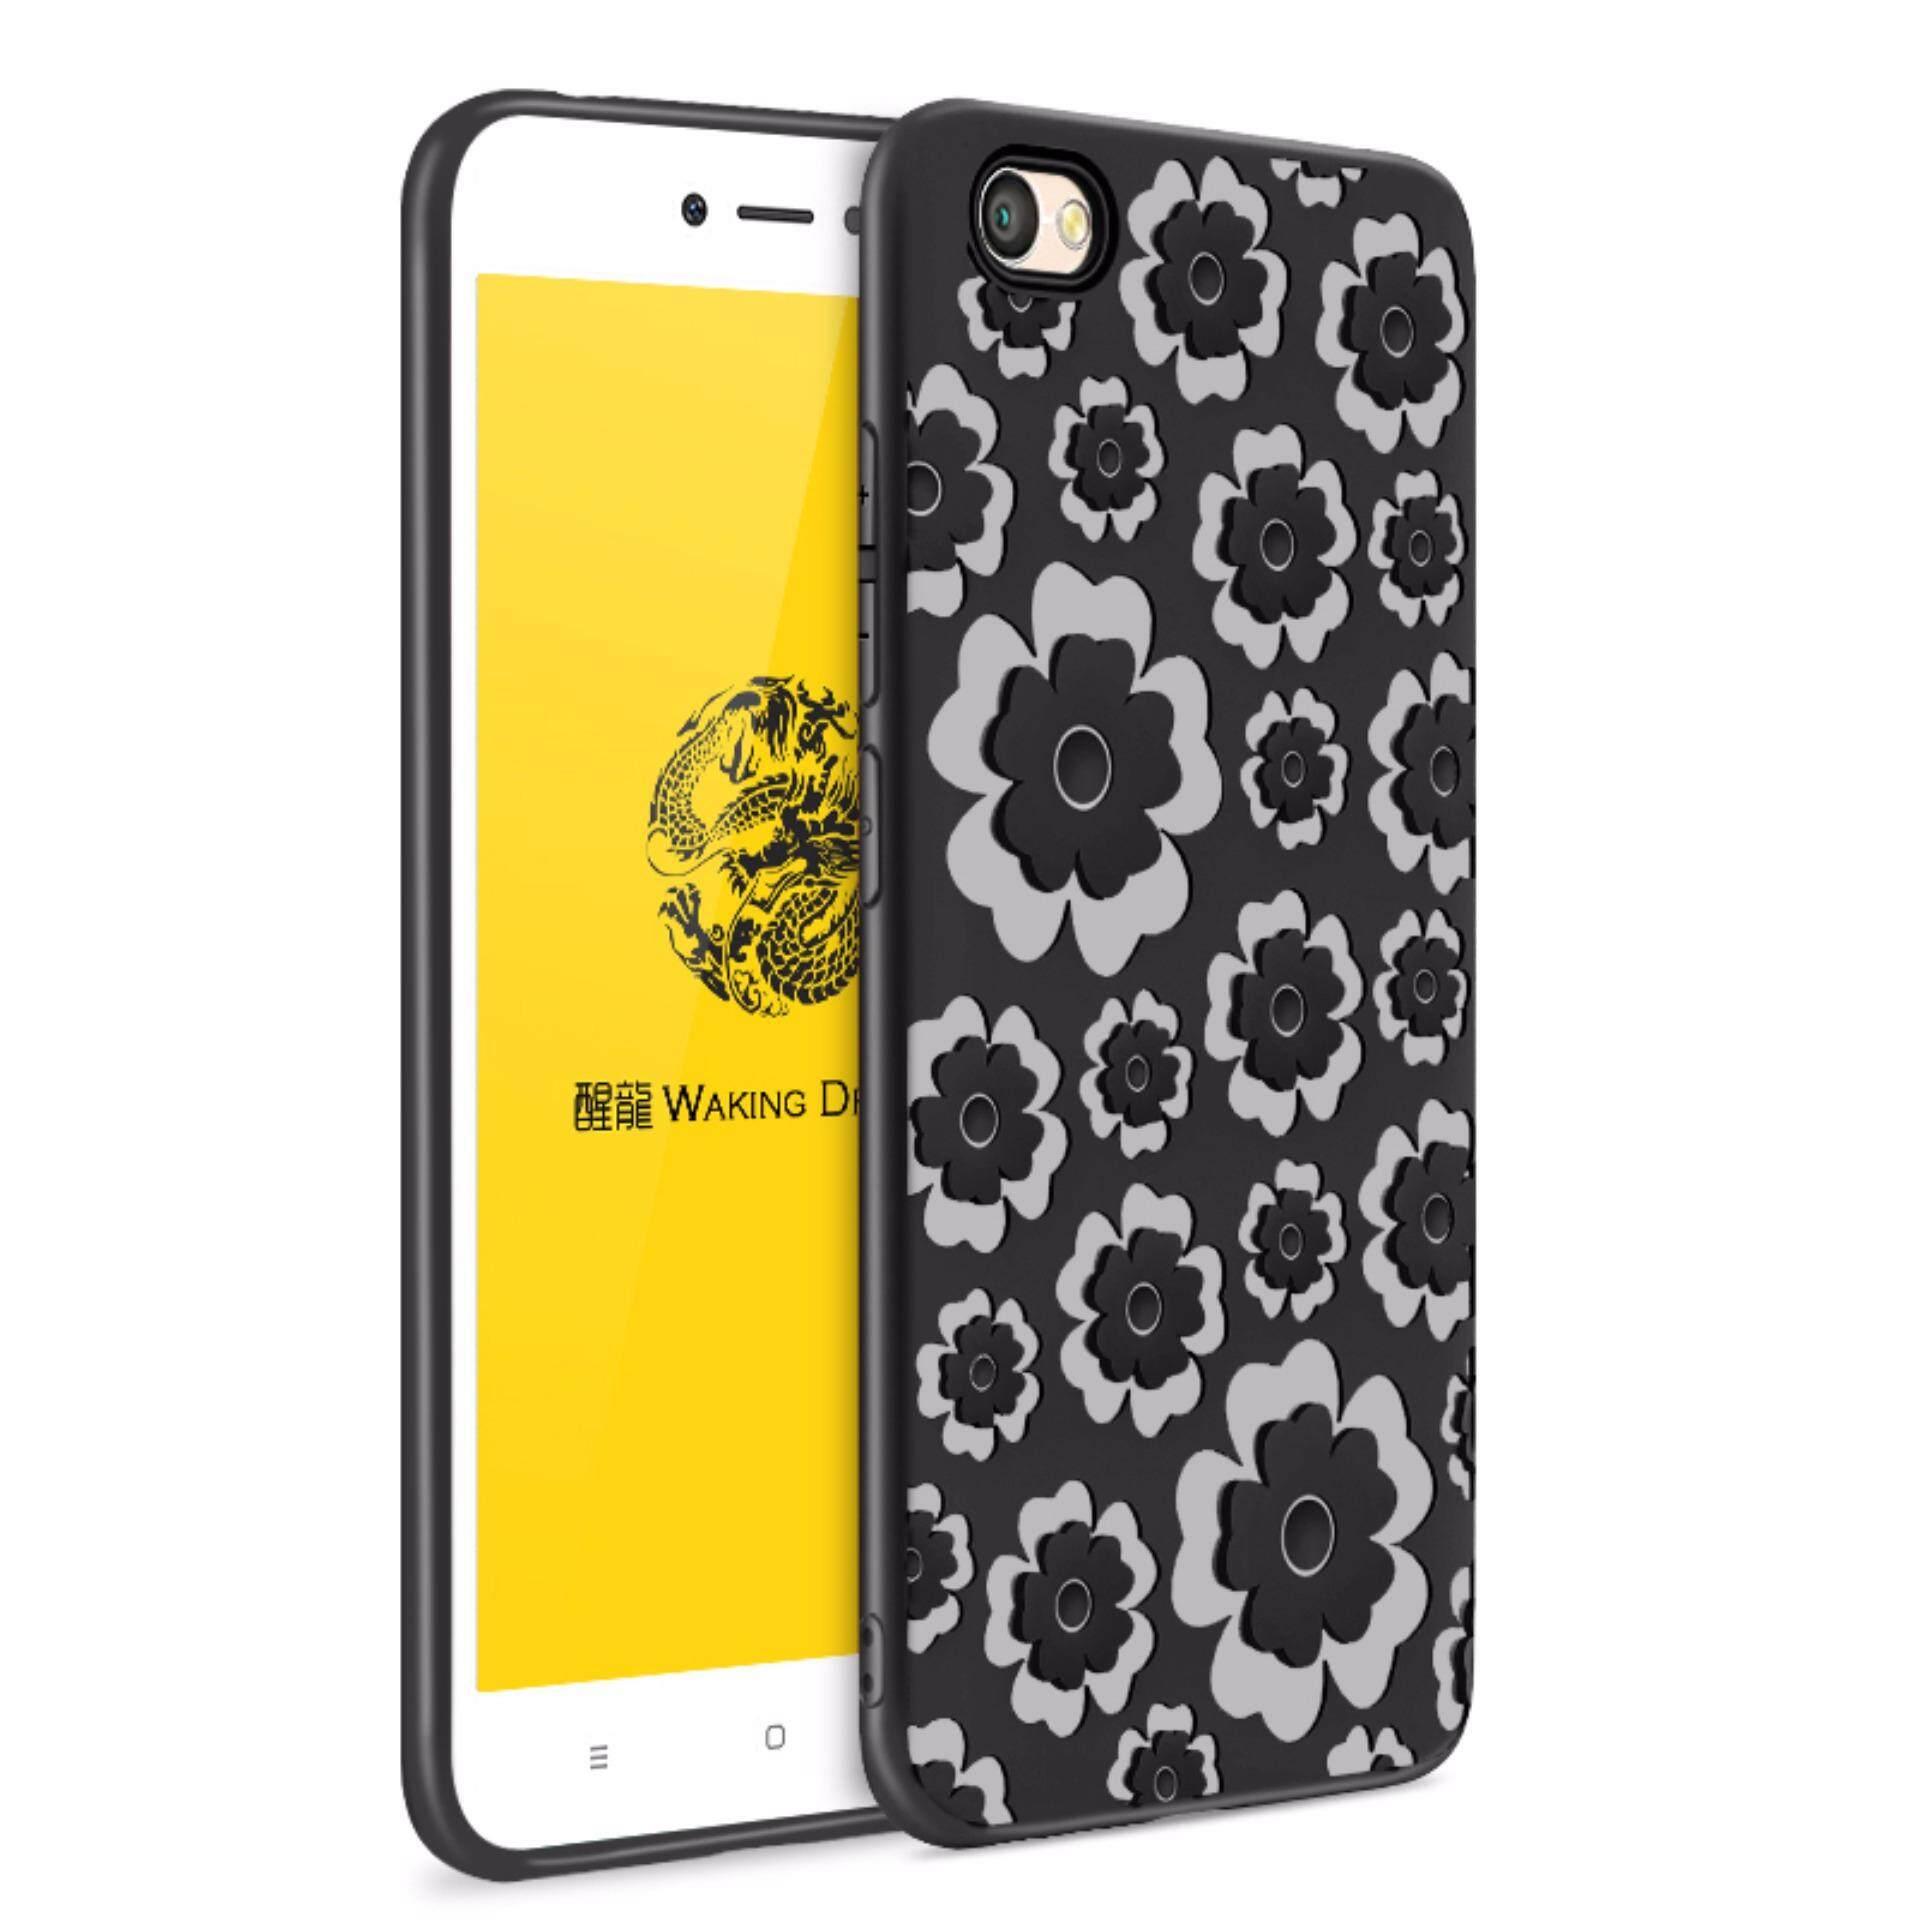 Engraved Flower TPU Shockproof Soft Phone Case for Xiaomi Redmi Note 5A / Xiaomi Redmi Y1